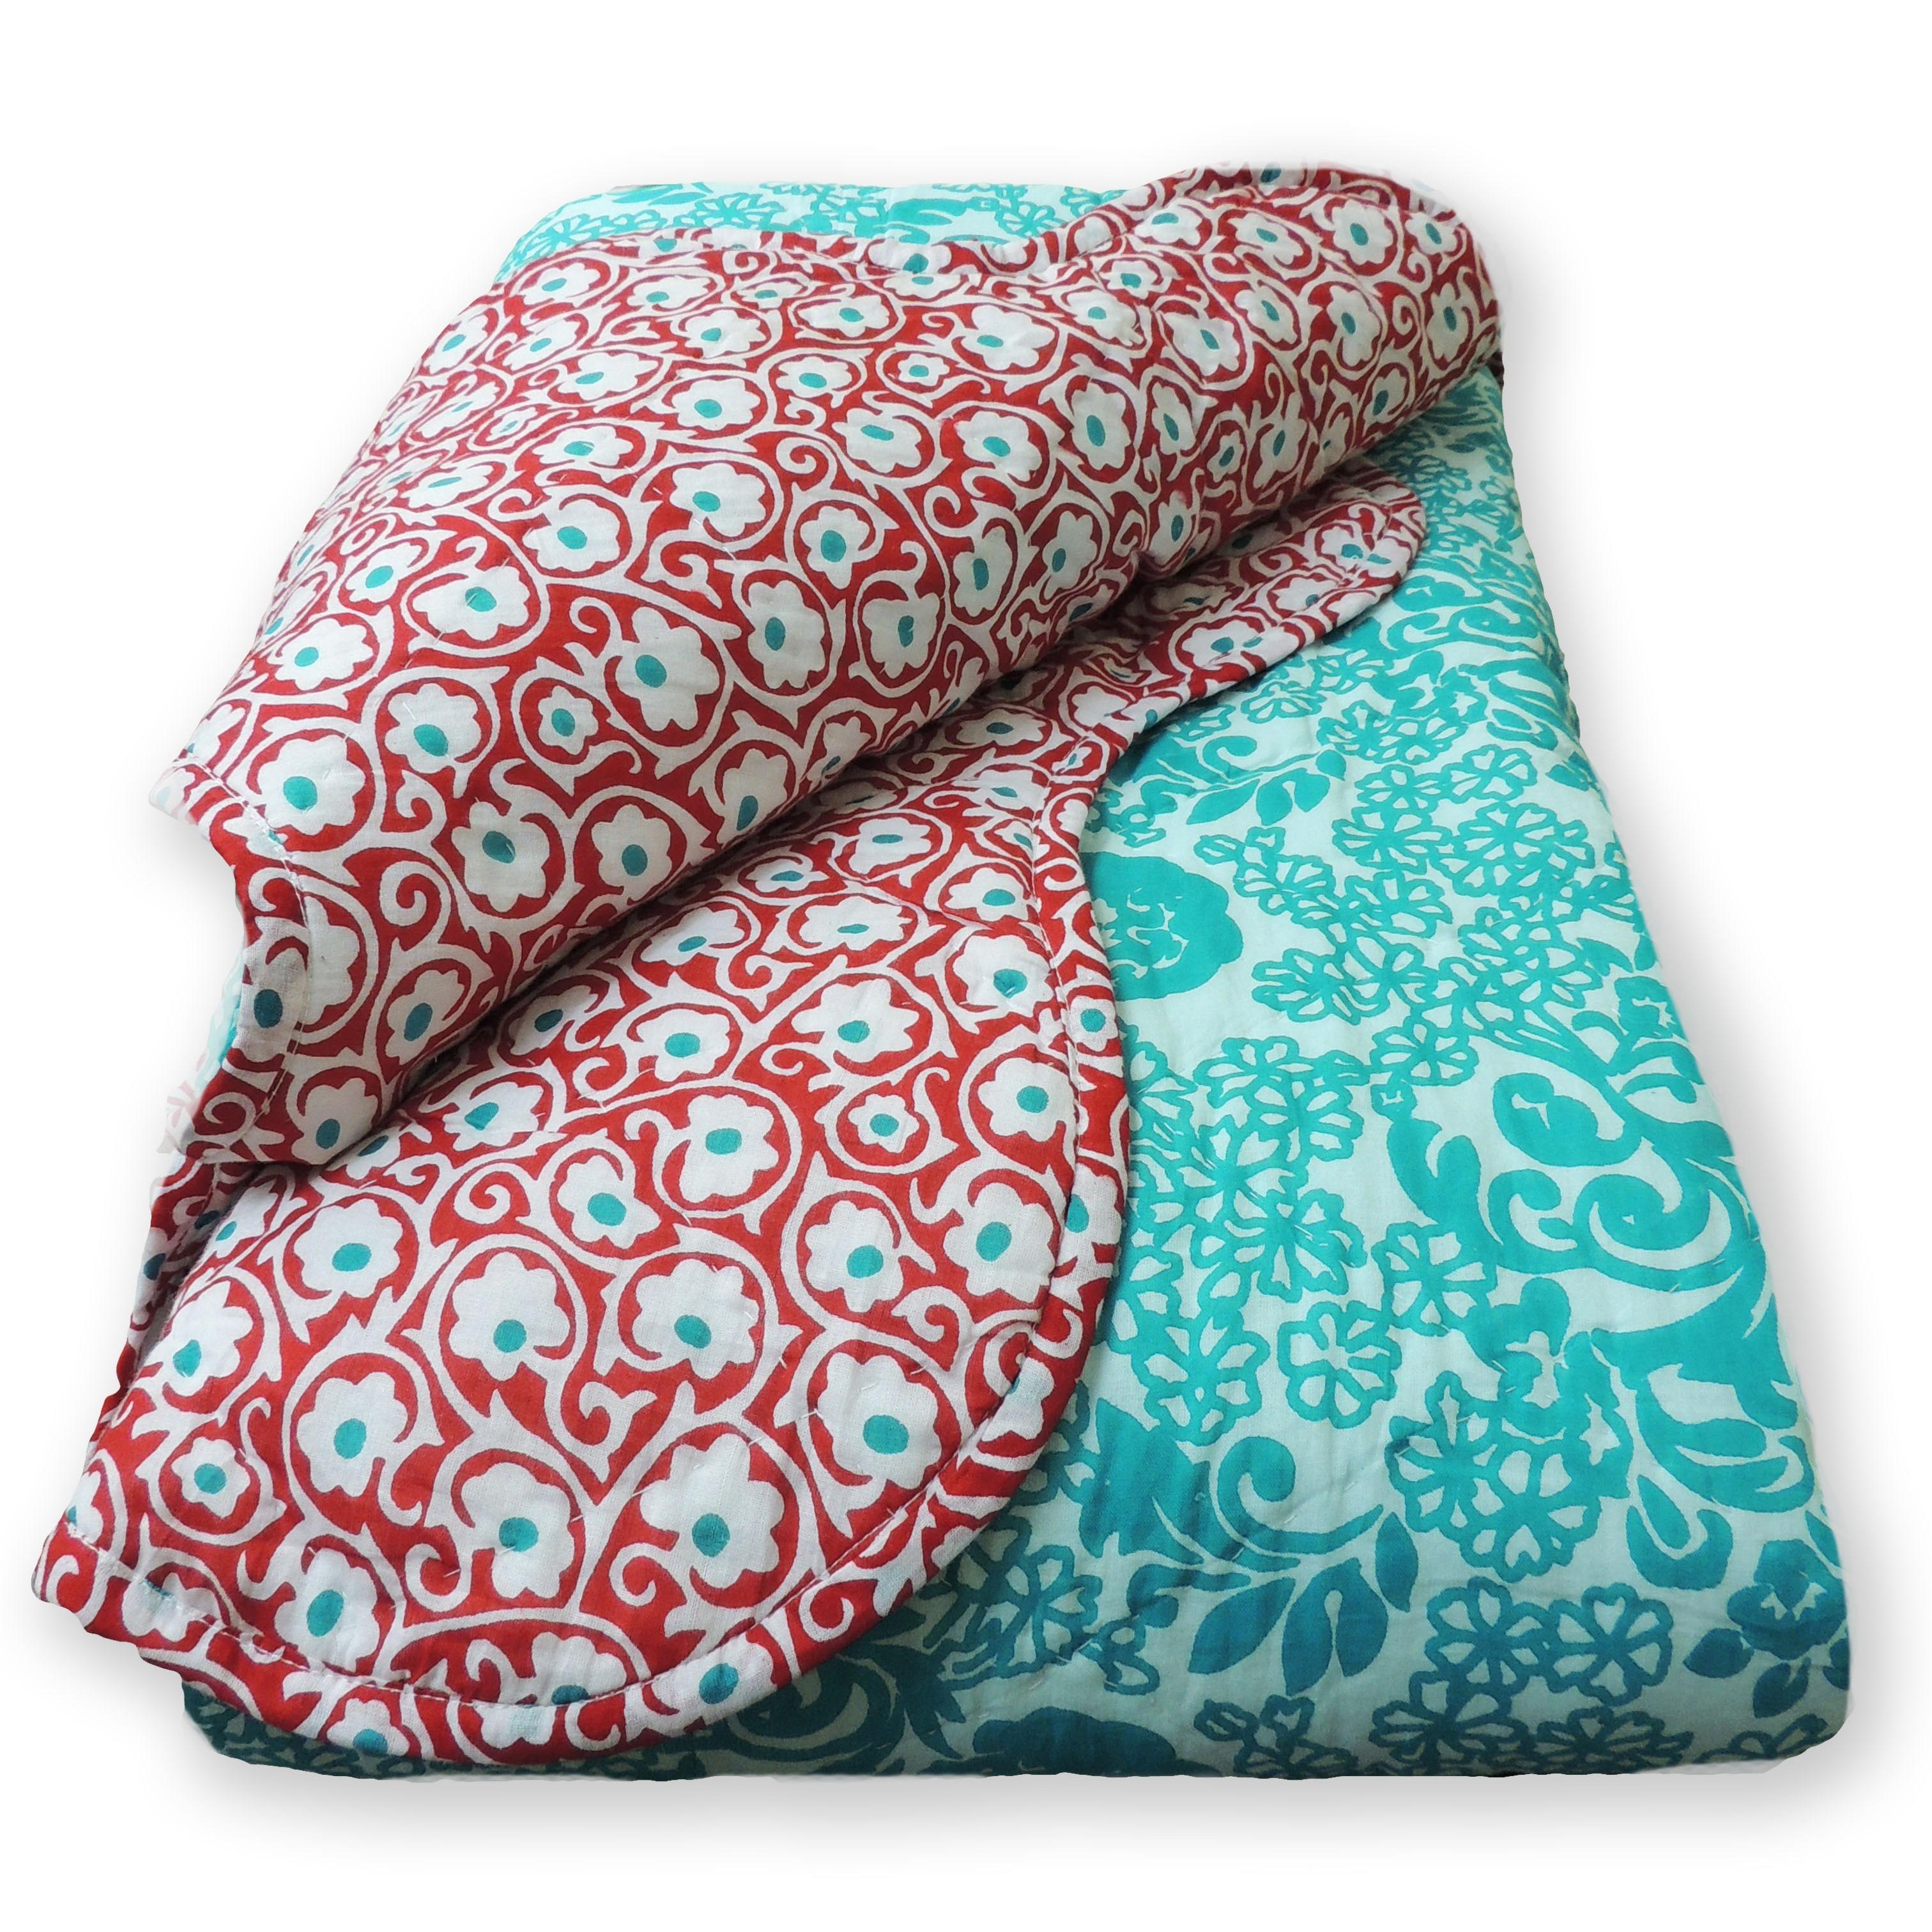 Cottage Home Ilda 3-piece Quilt Set (Queen), Blue teal (C...